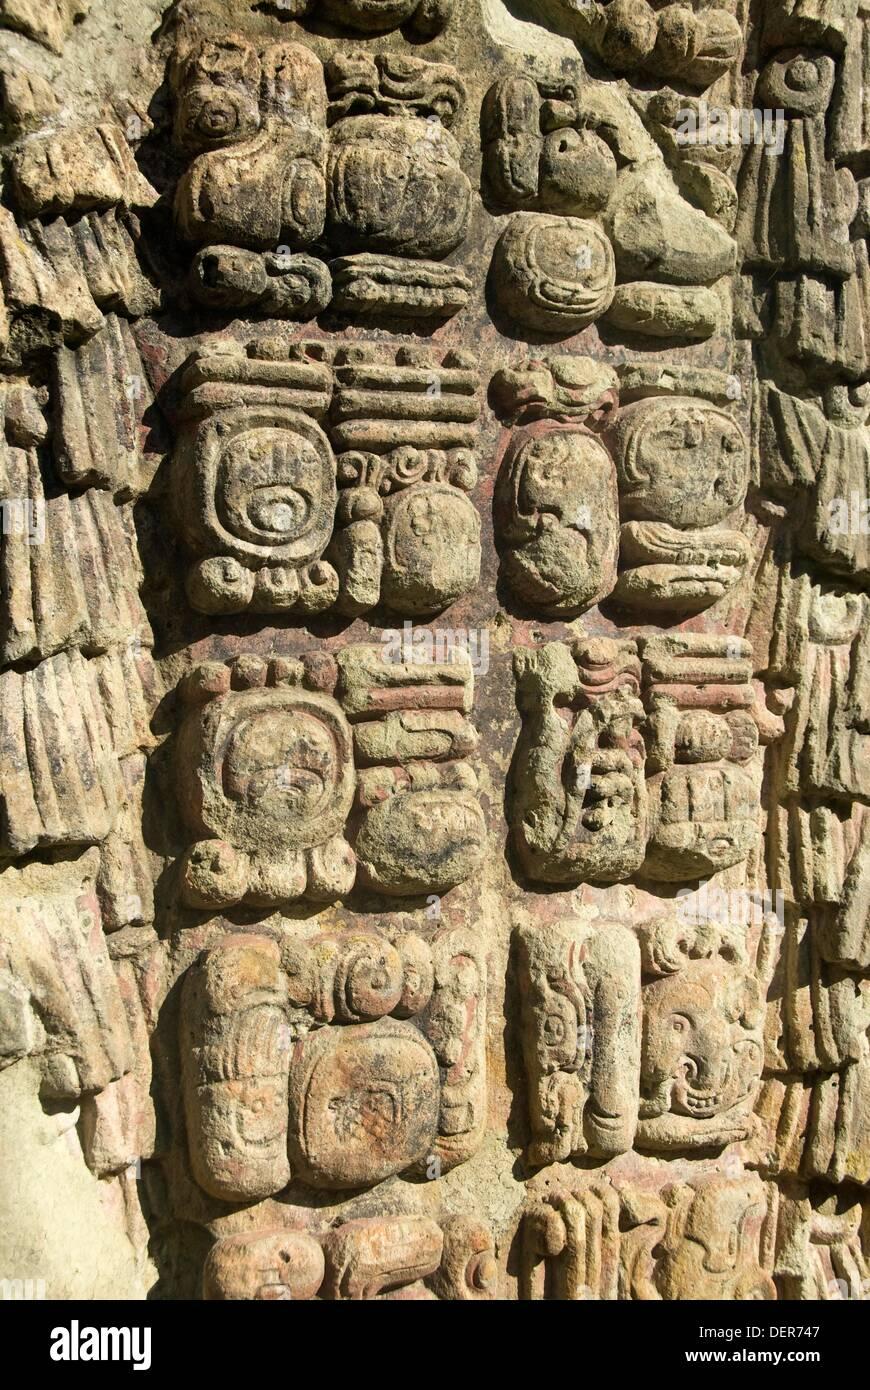 Stela A (AD 731), Copan archaeological park, Copan Ruinas, Honduras - Stock Image